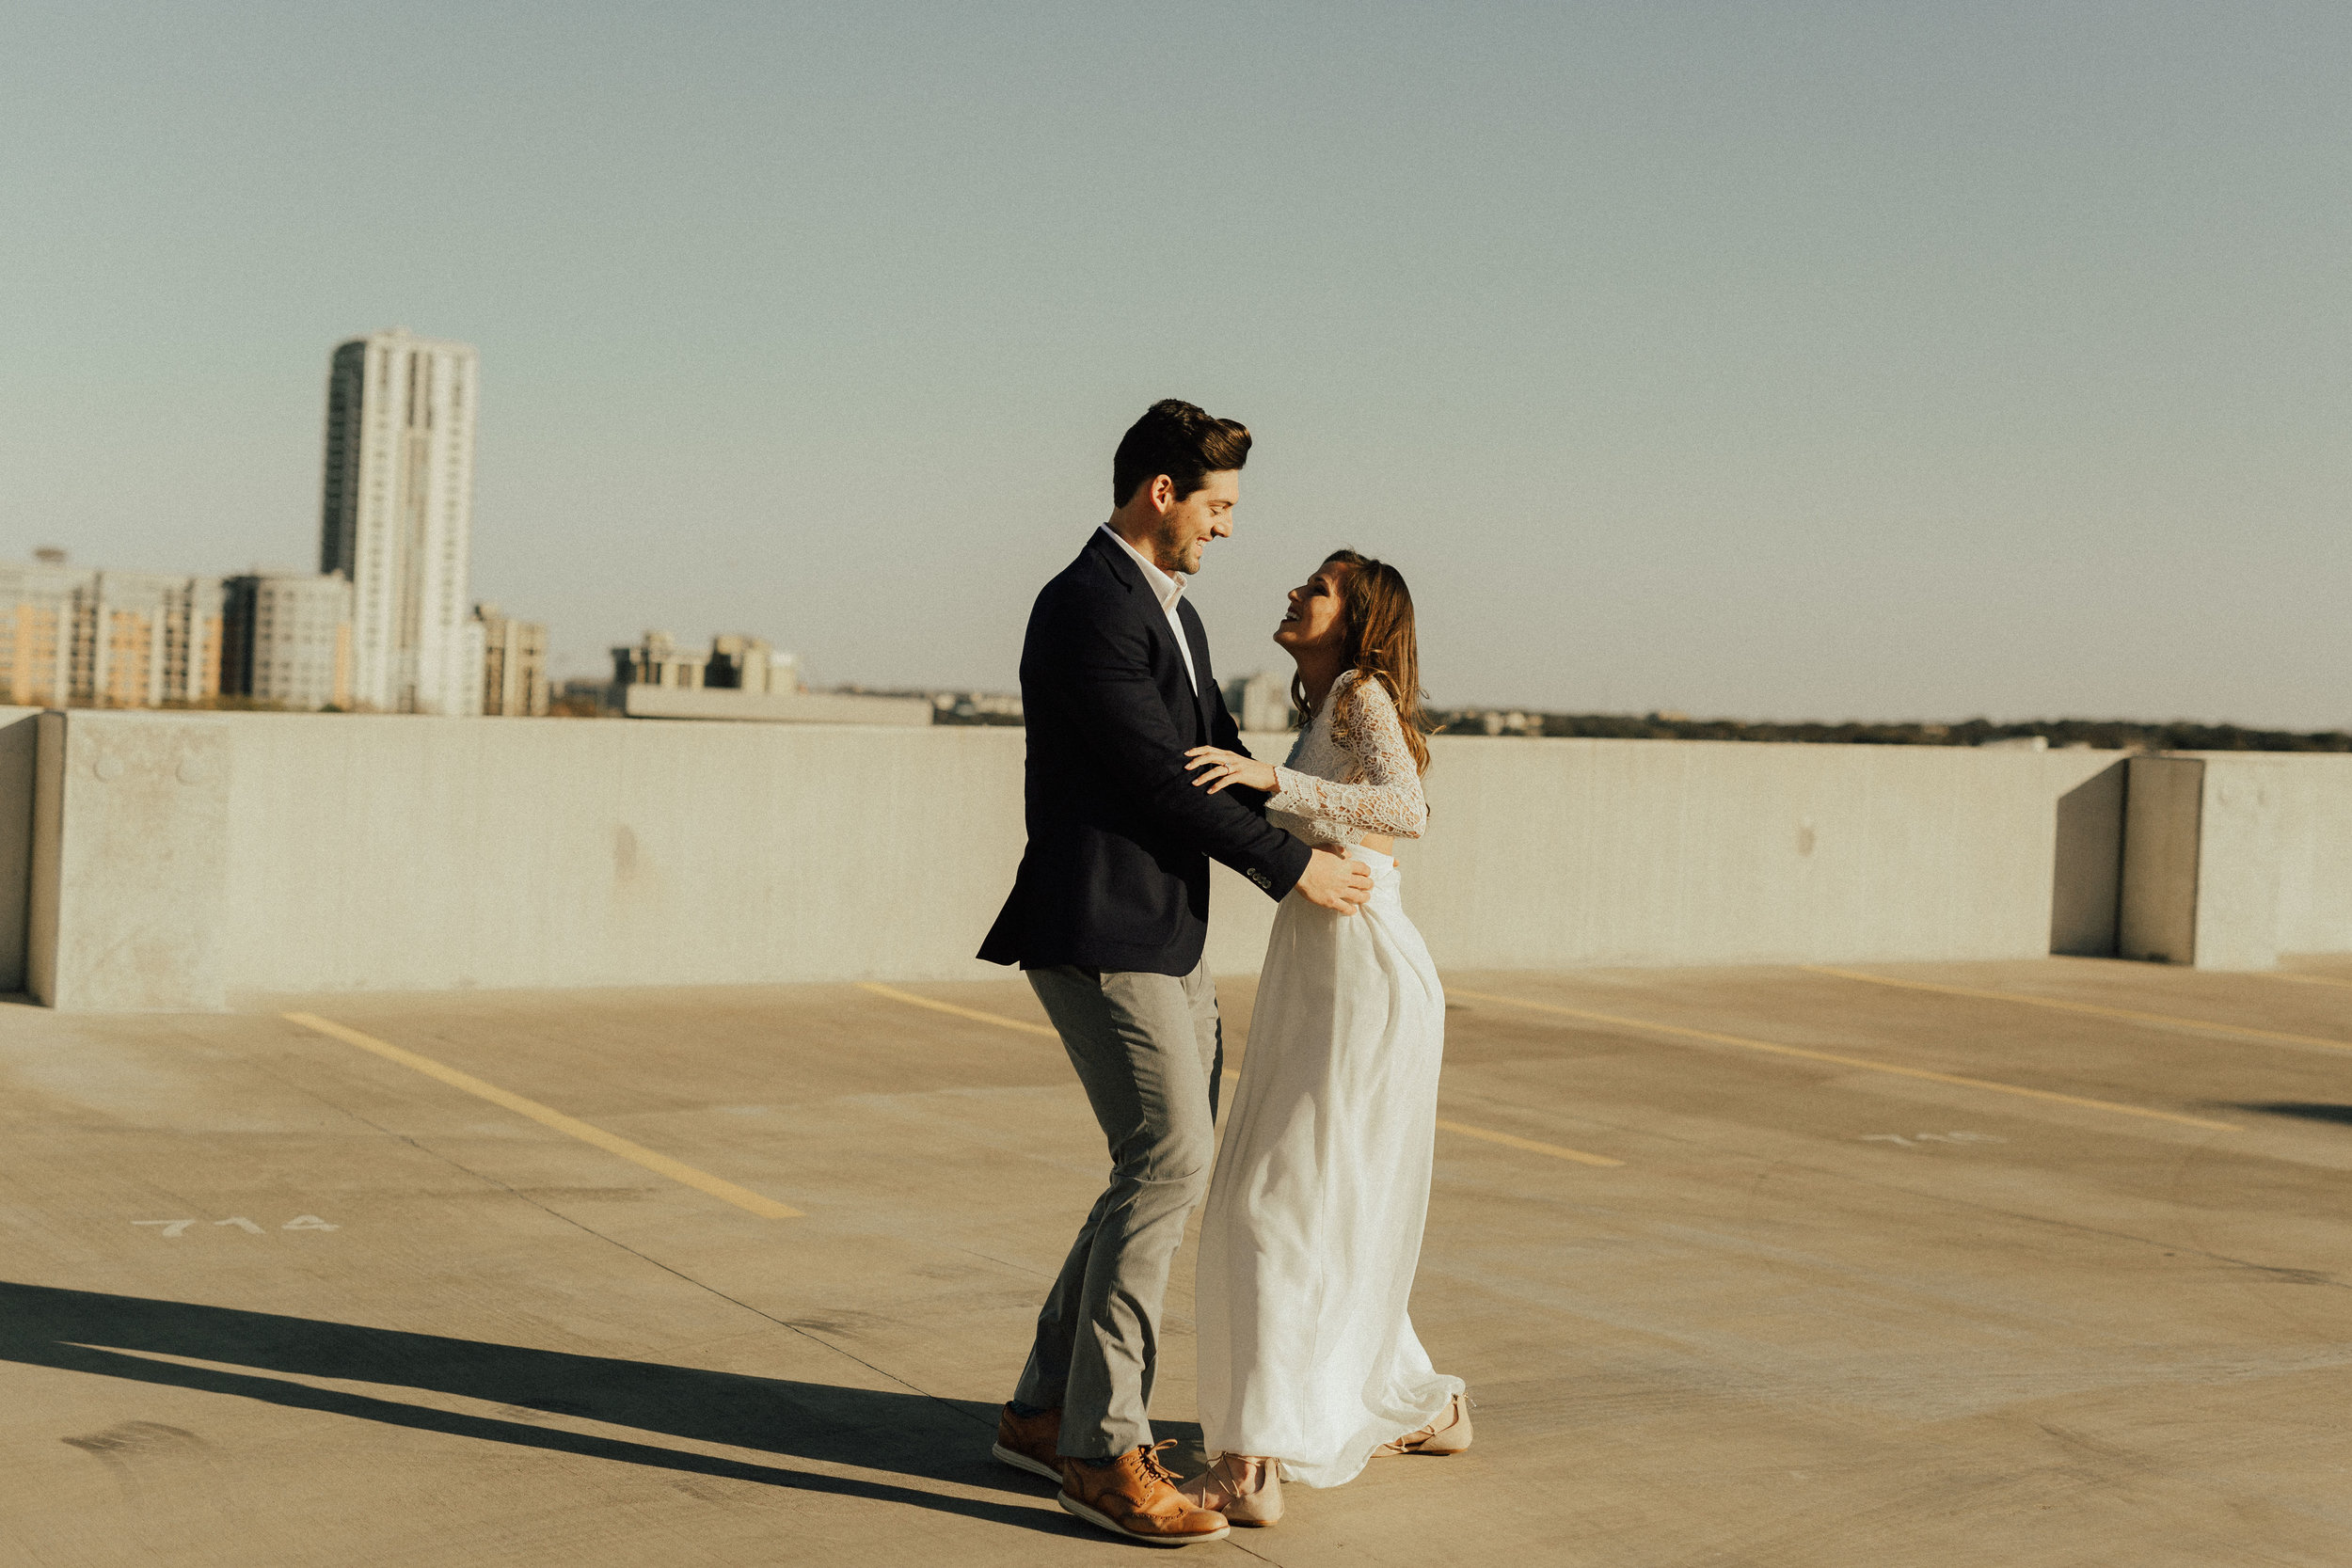 Morgan -Christian-Engagements-Austin-texas-skyline-Emma-Long-Metropolitan-Park-texas-photographer-18